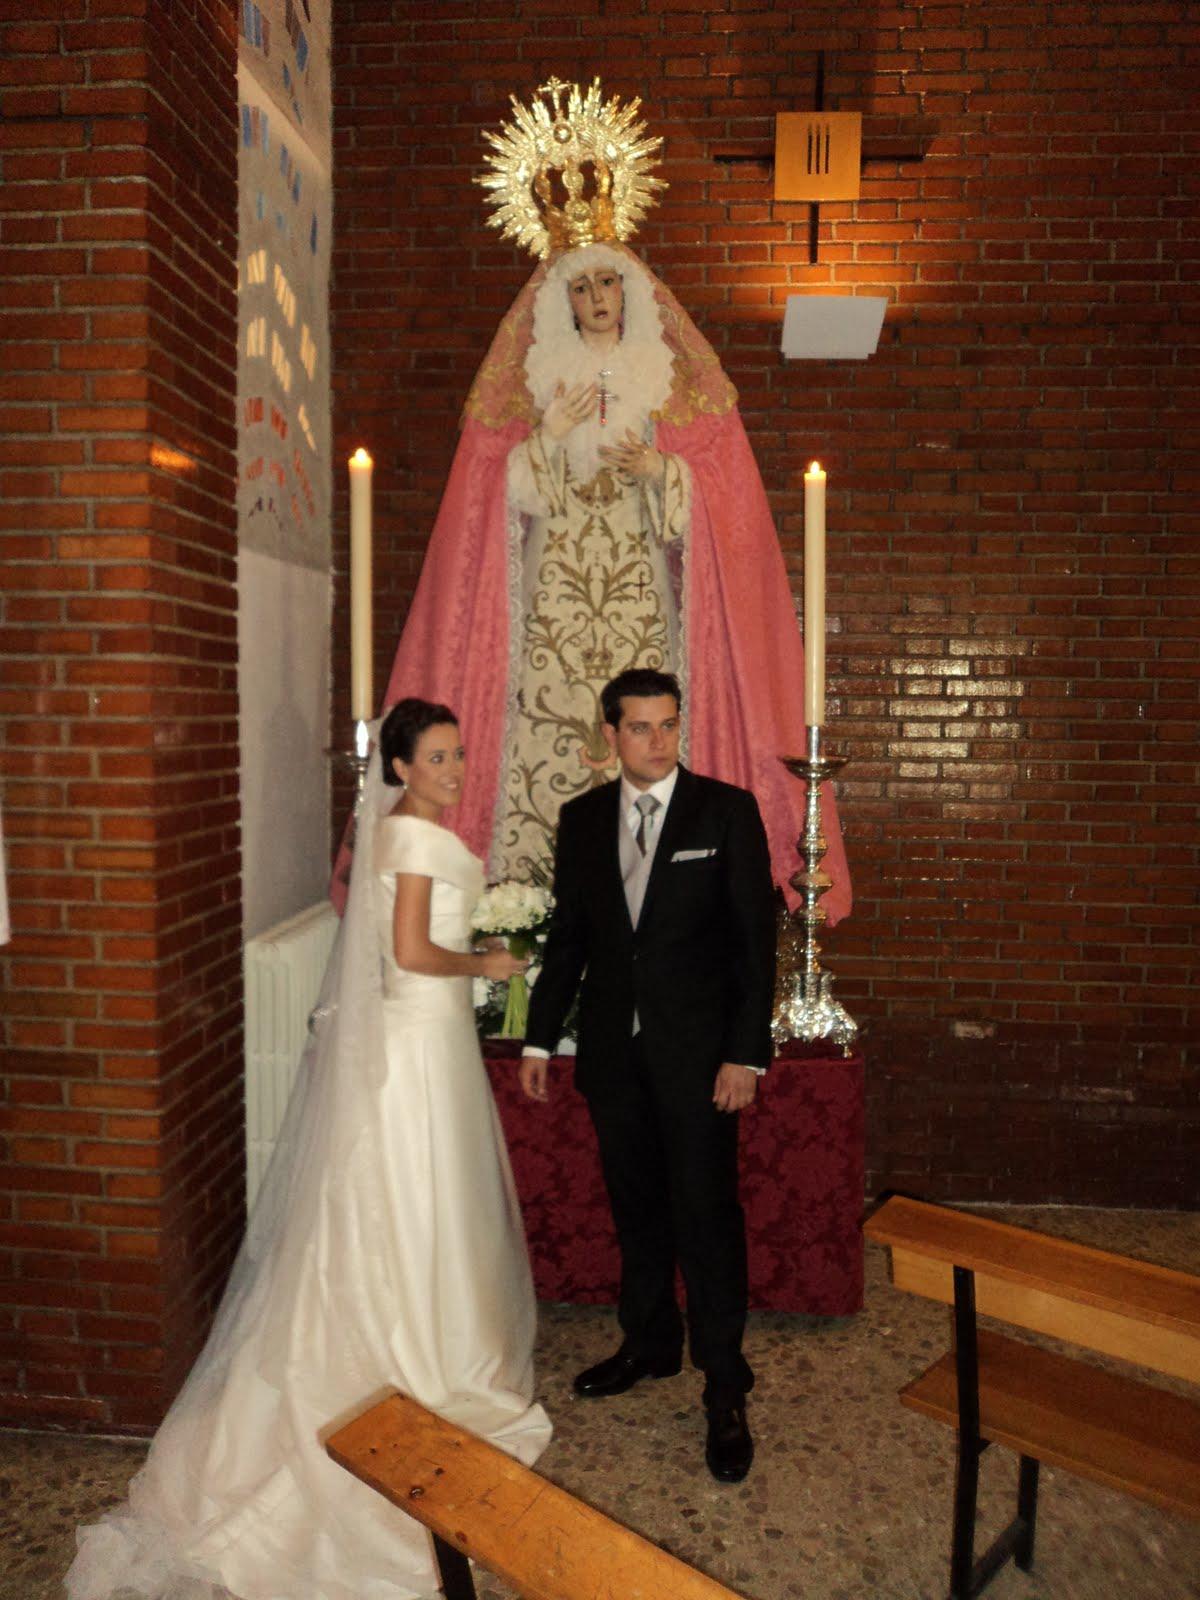 Matrimonio Gipsy Real Time Streaming : Imagenes animadas del sacramento matrimonio dibujos